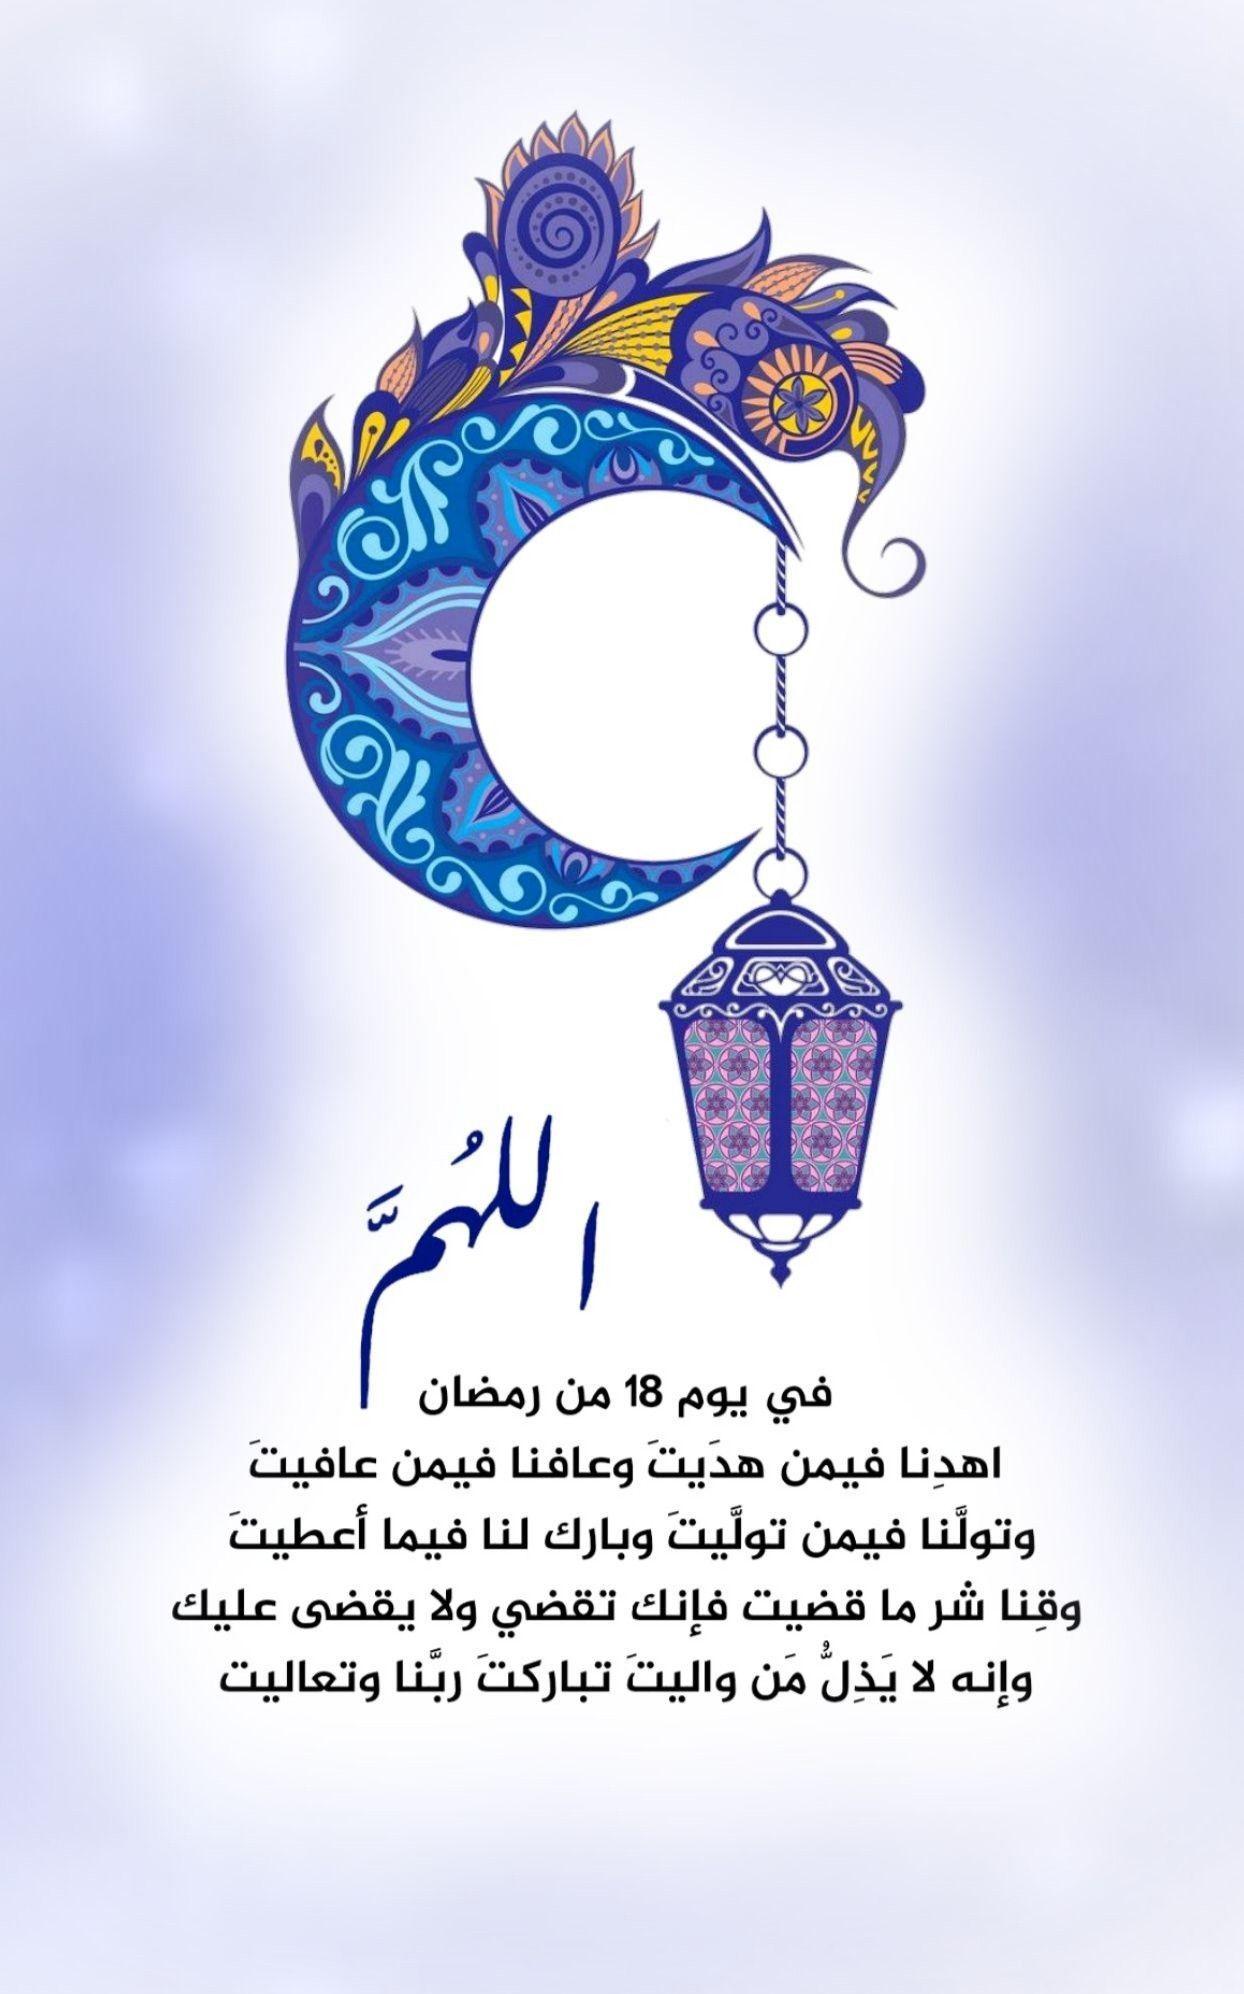 Pin By صورة و كلمة On رمضان كريم Ramadan Kareem In 2020 Islamic Quotes Wallpaper Ramadan Kareem Ramadan